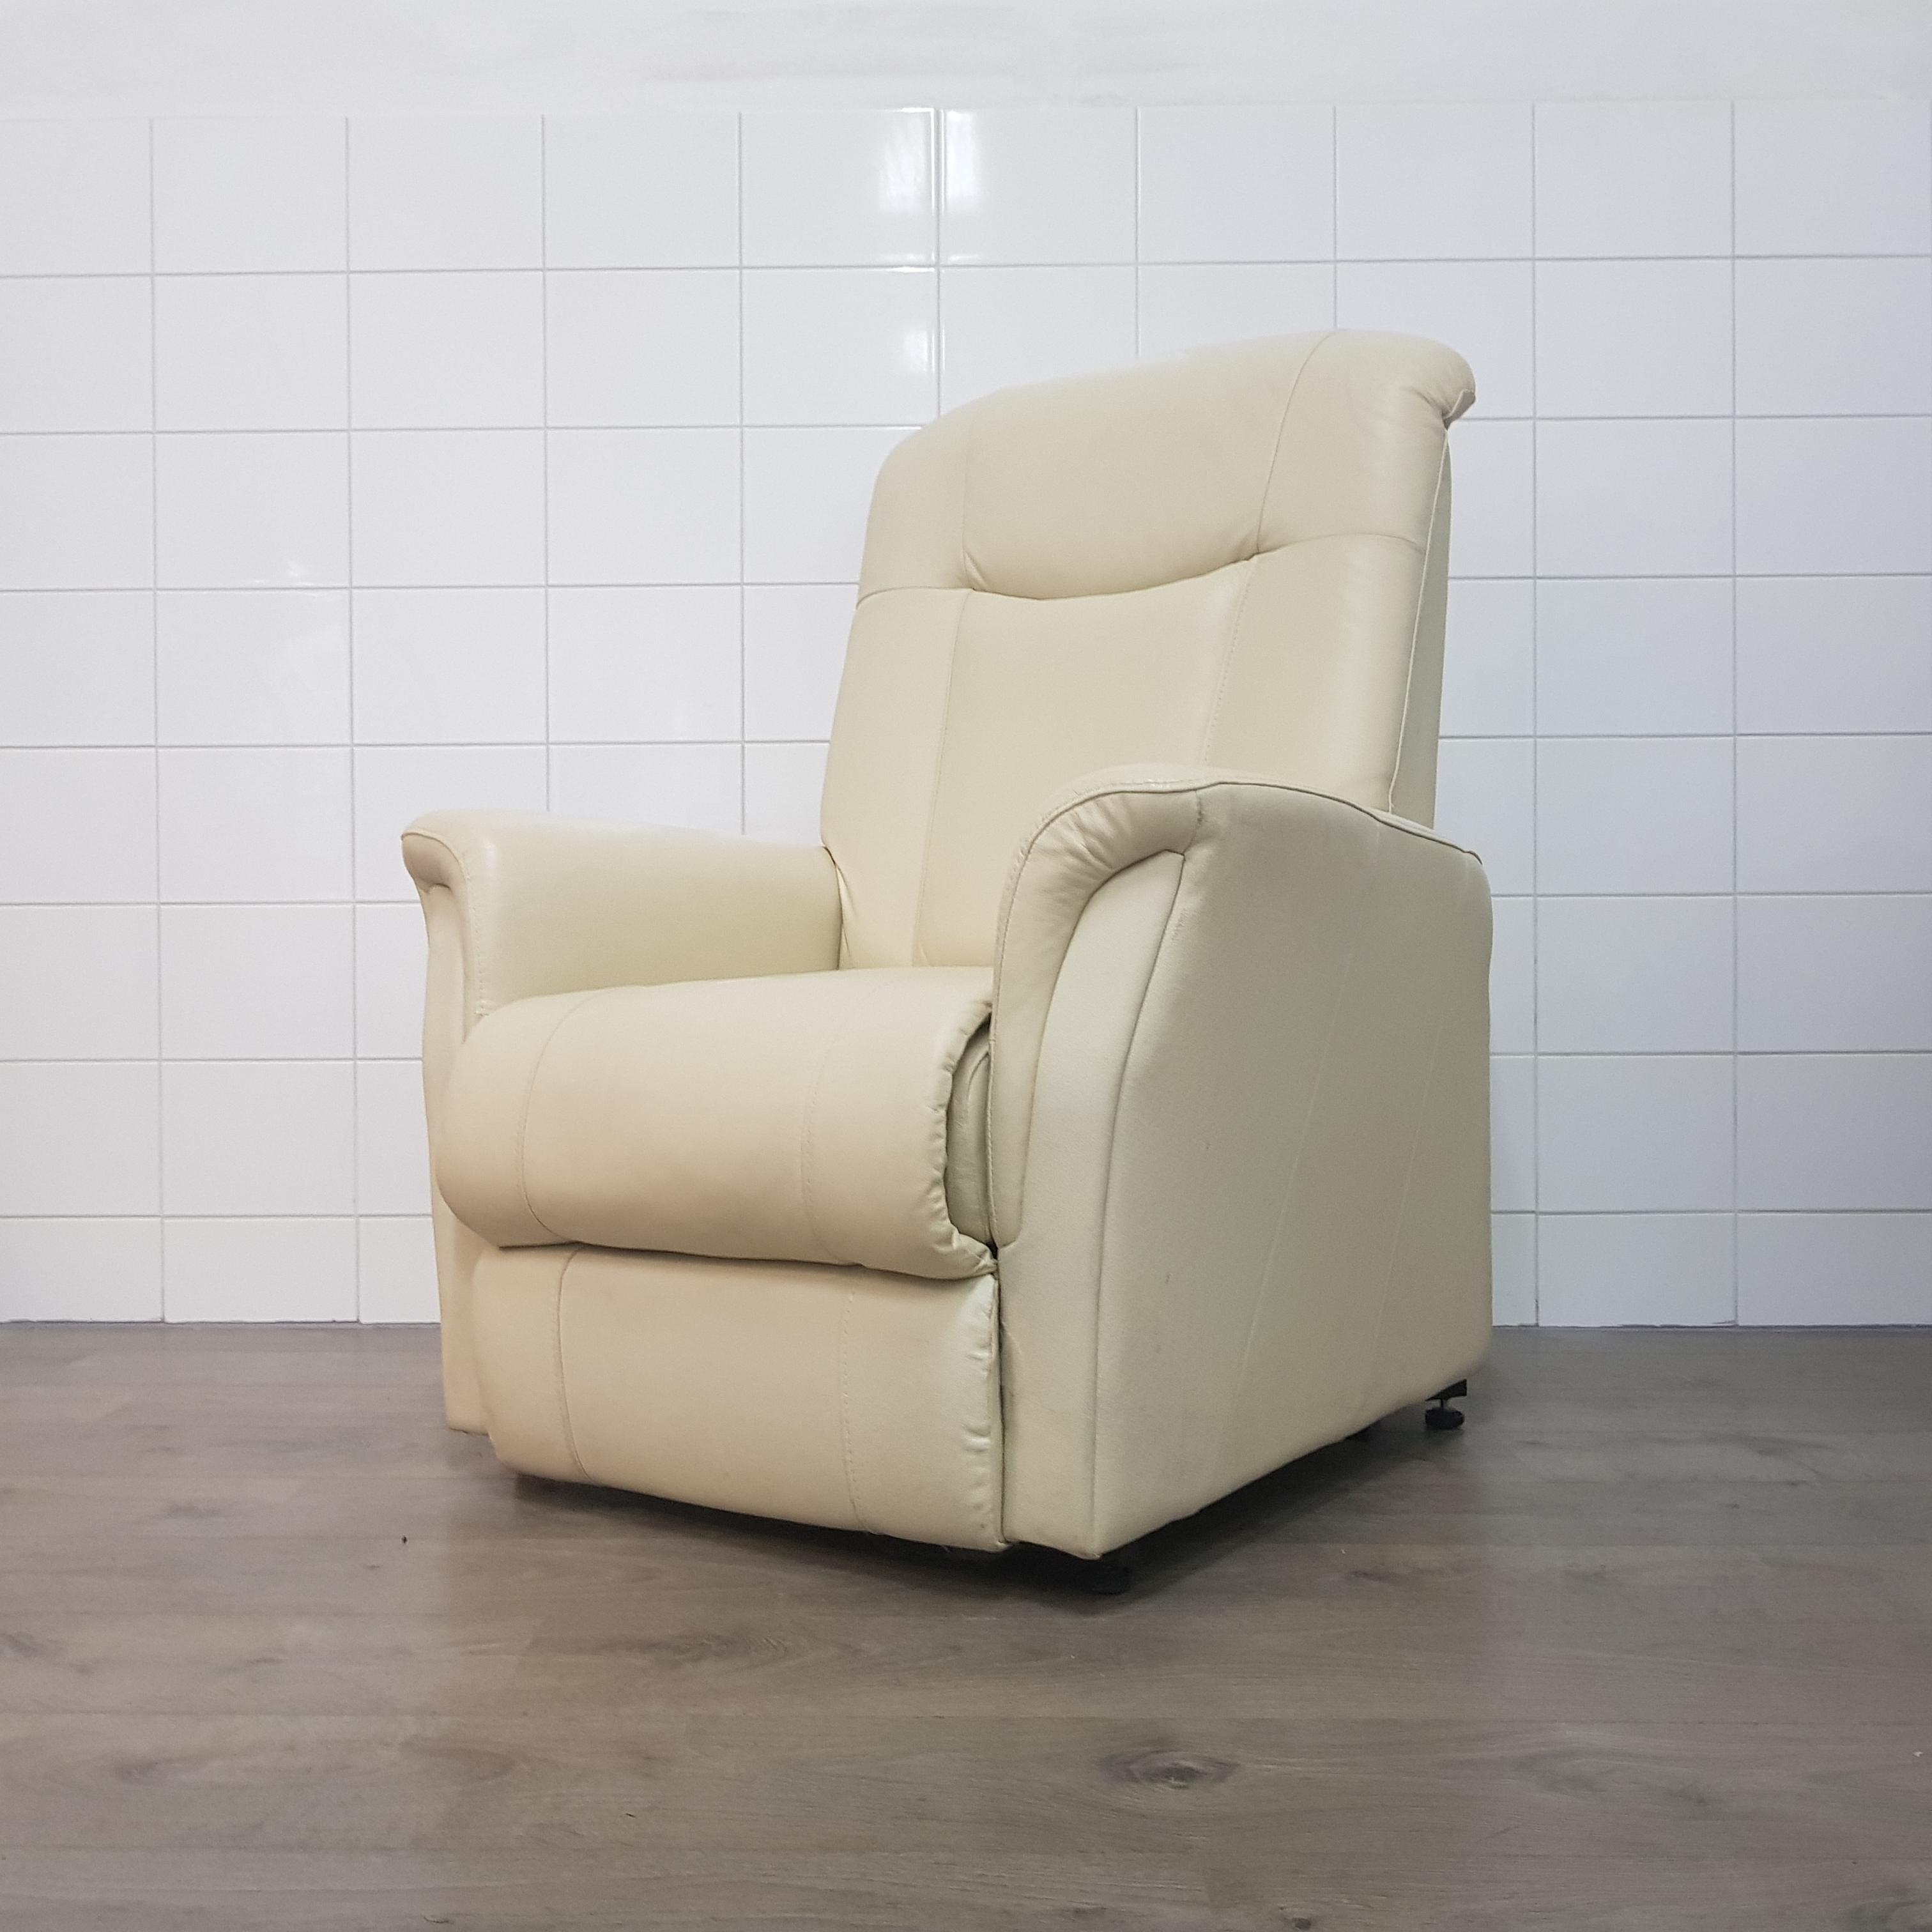 sta-op stoel one